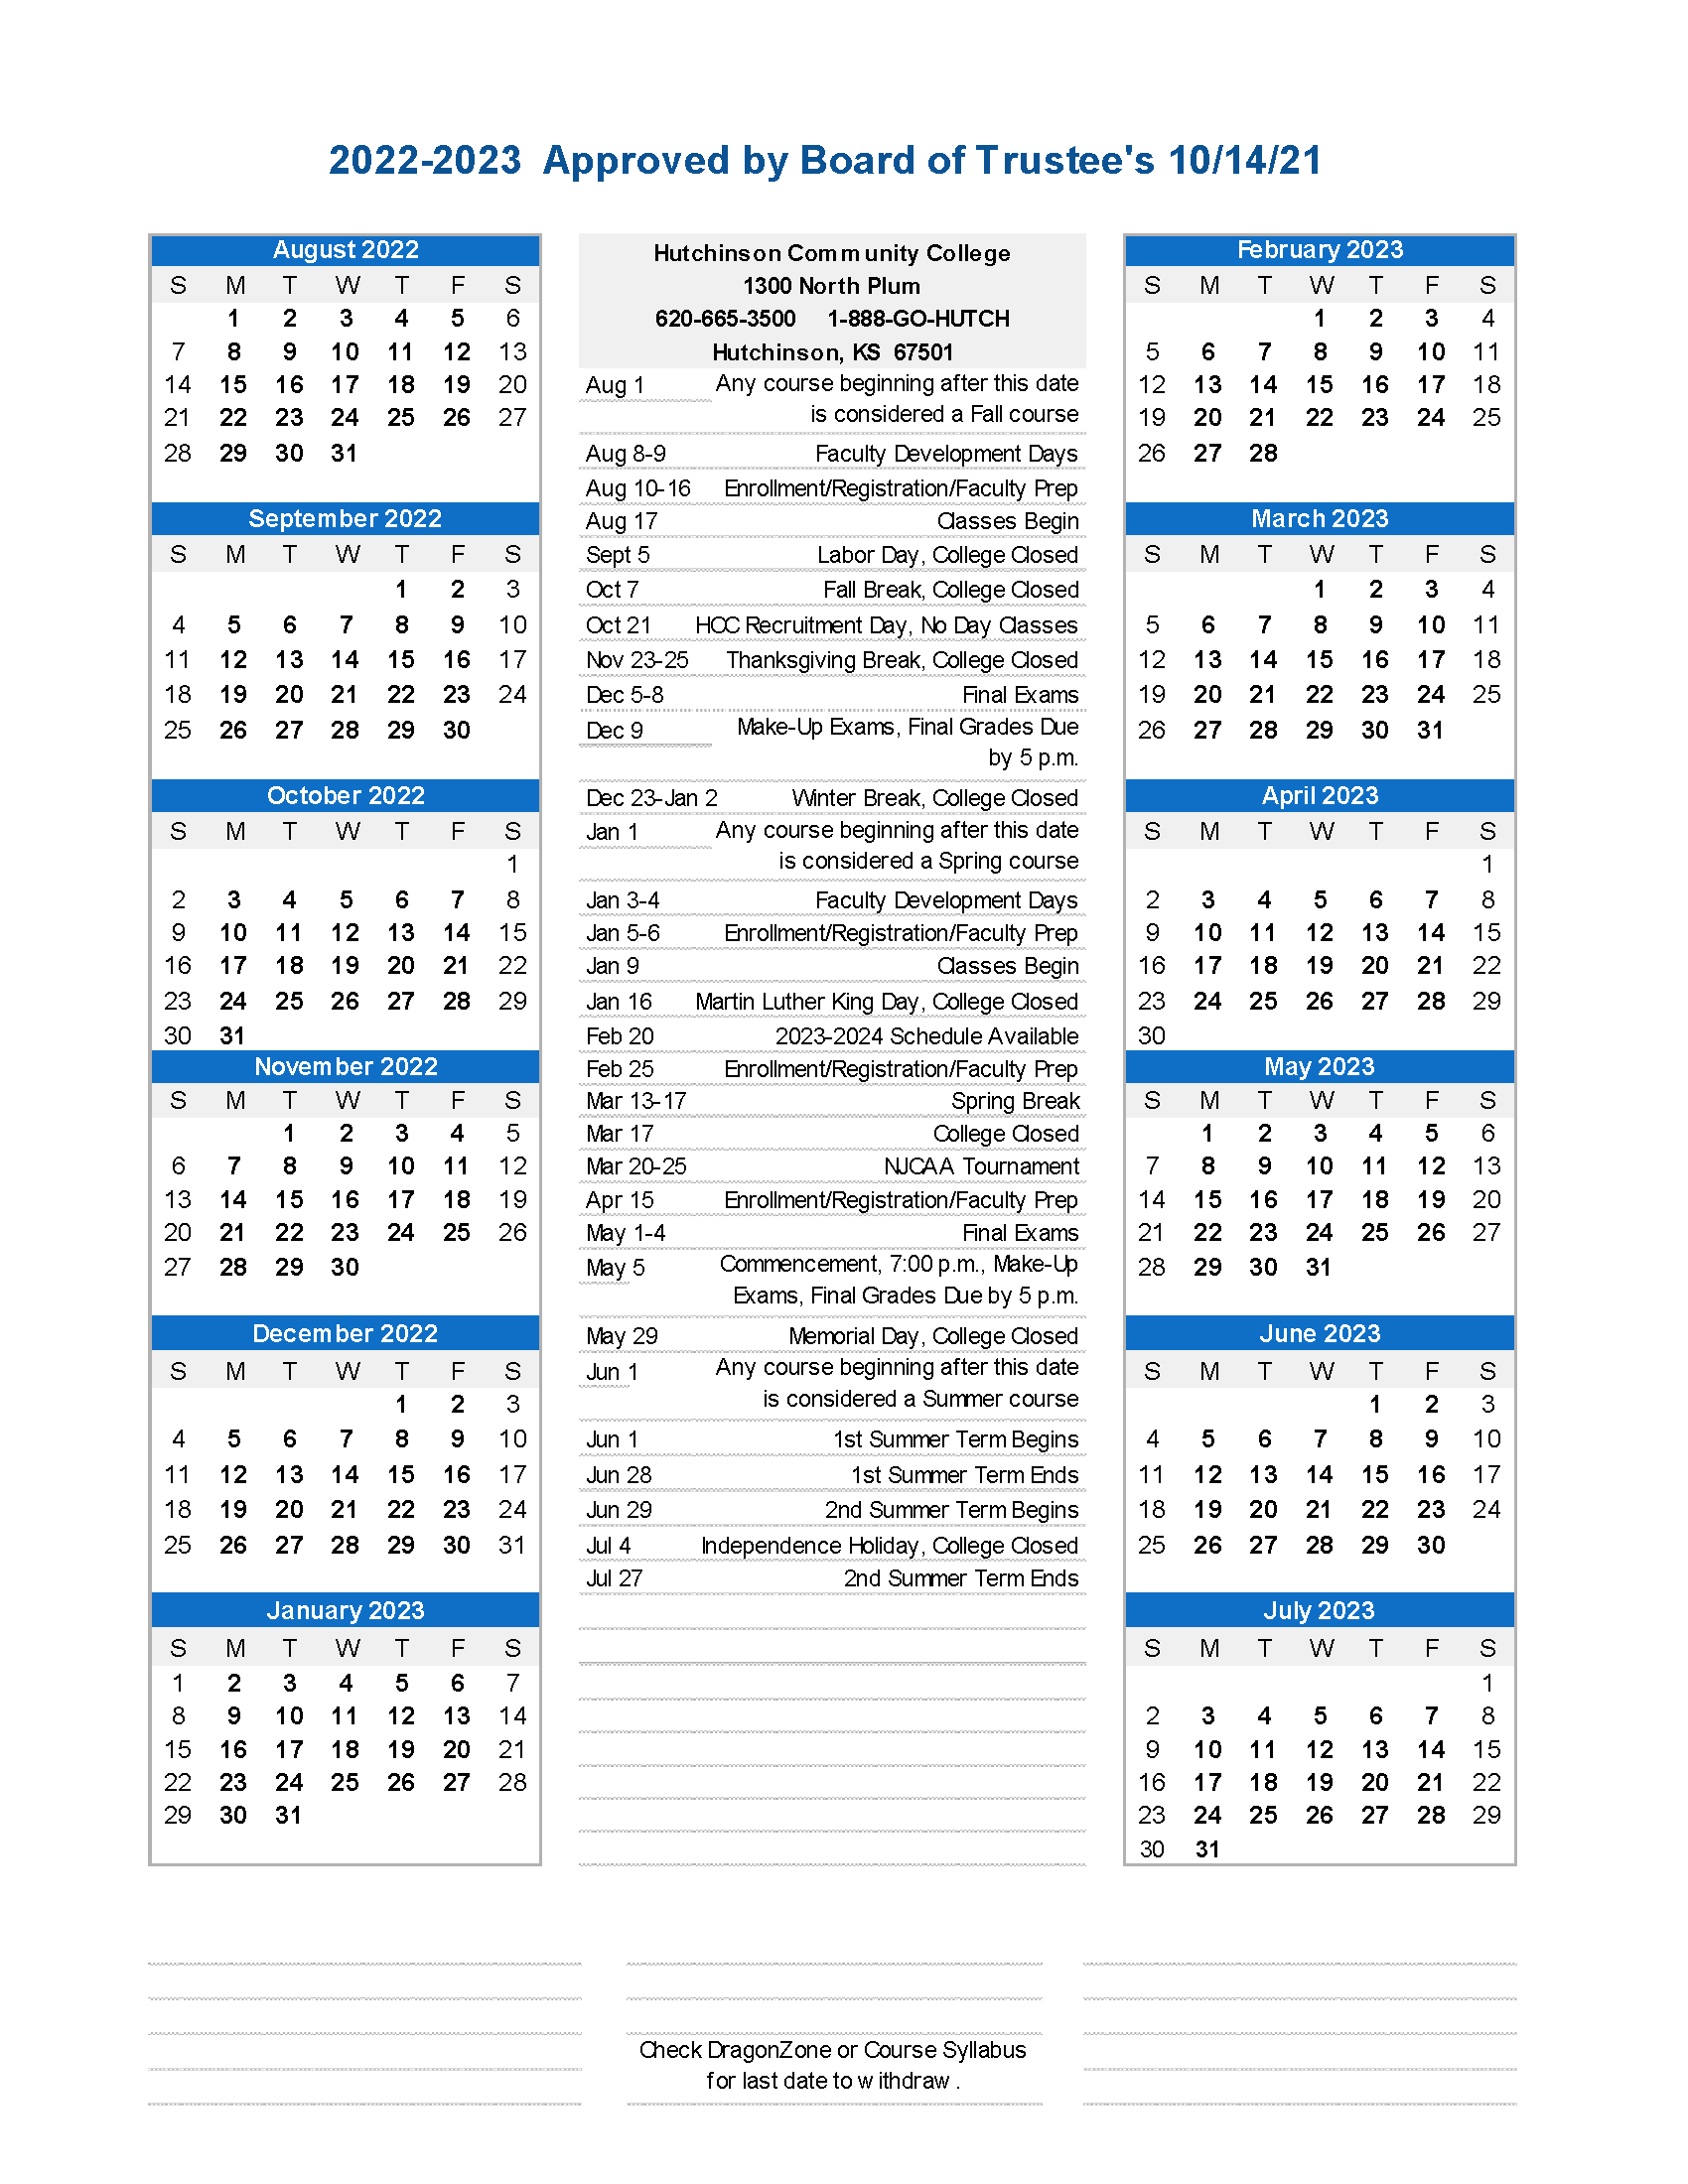 Academic Calendar - 2022-2023